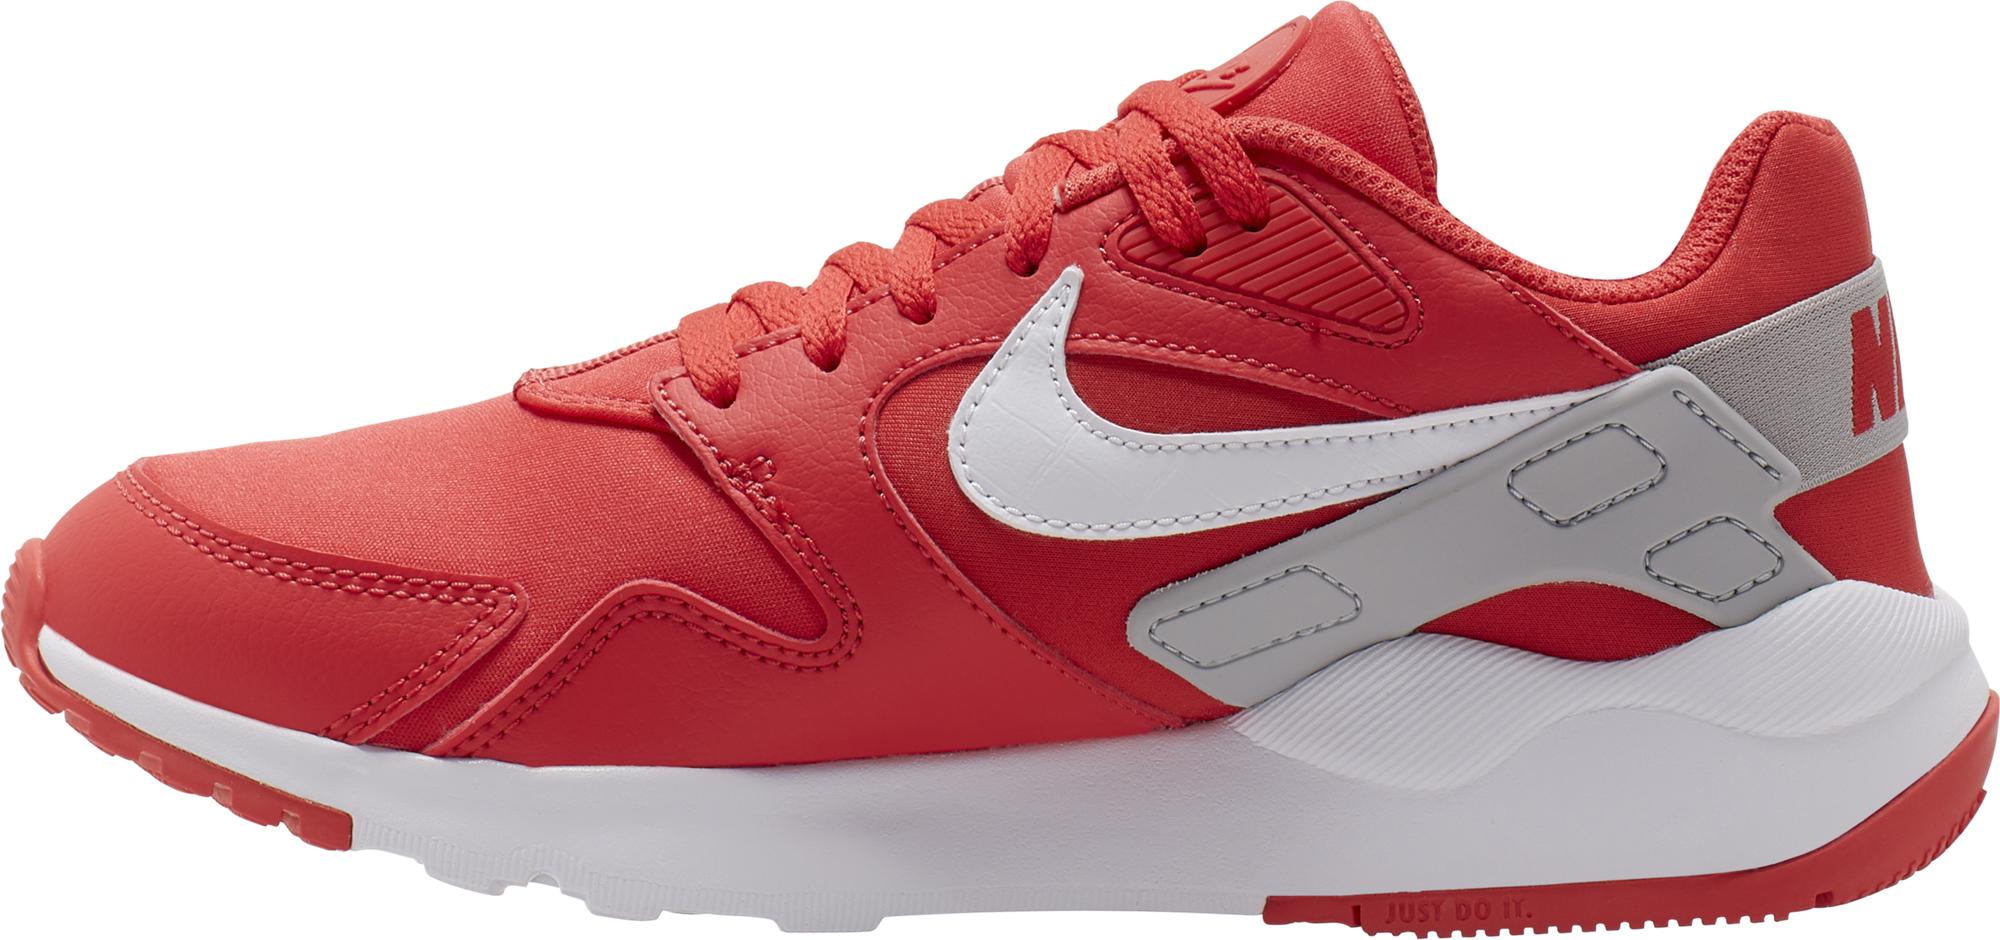 Nike Кроссовки женские Nike Ld Victory, размер 40 цена